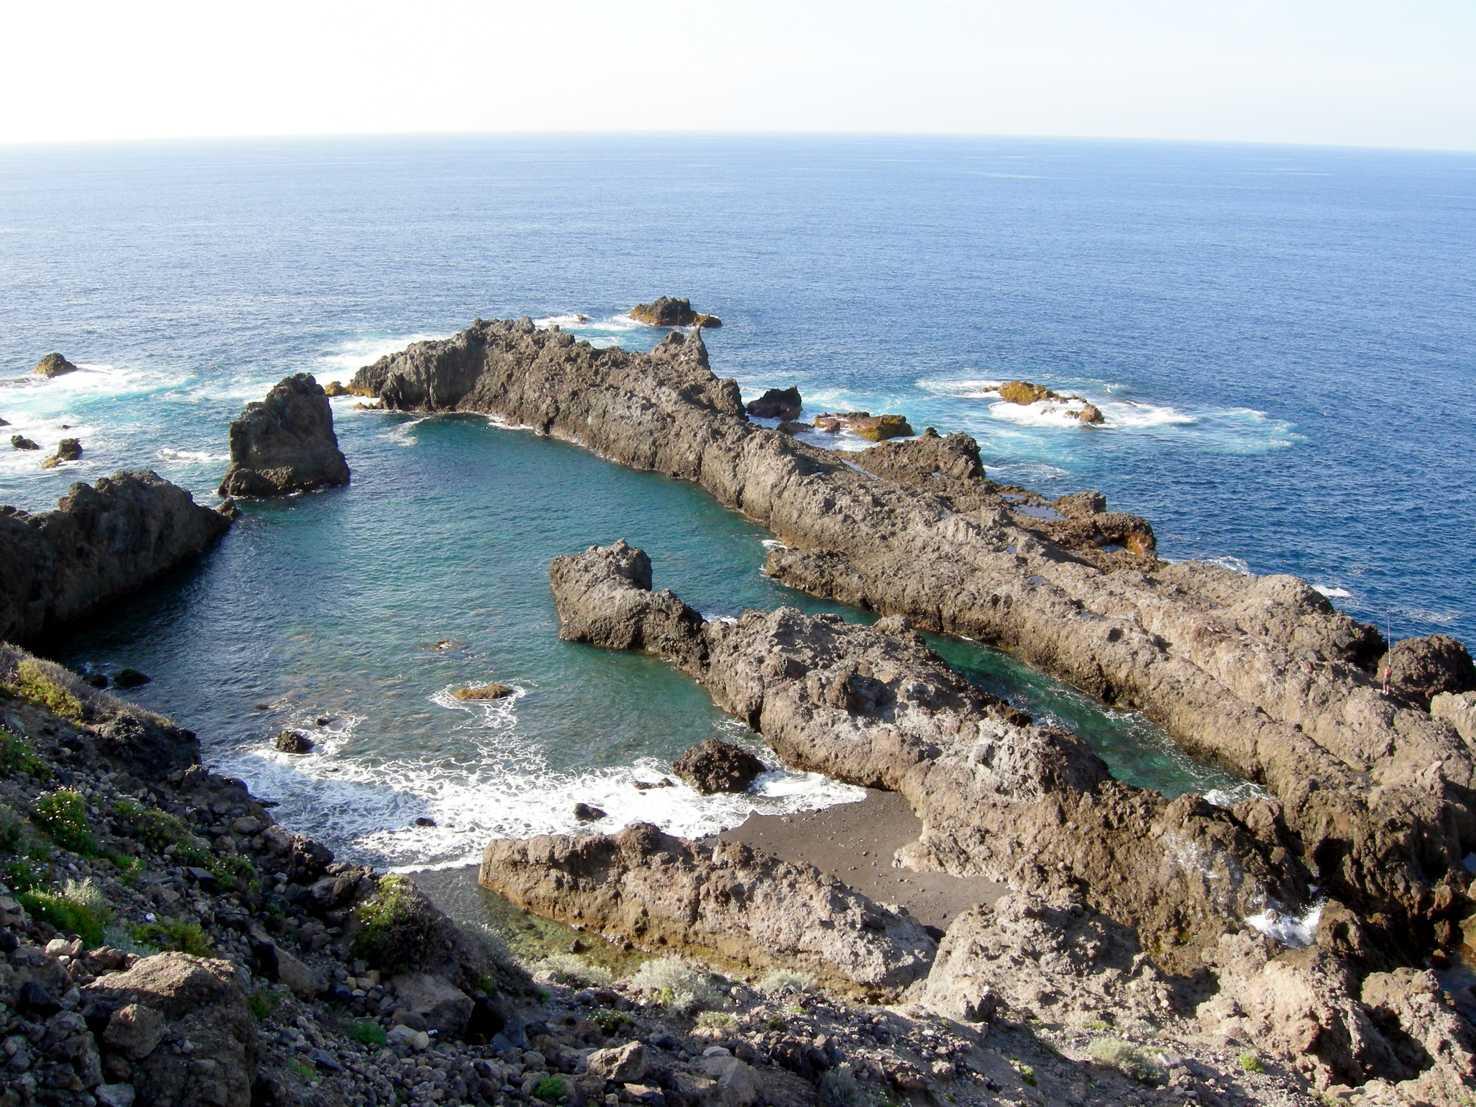 Las 10 mejores piscinas naturales de tenerife a d nde for Charcos naturales en tenerife